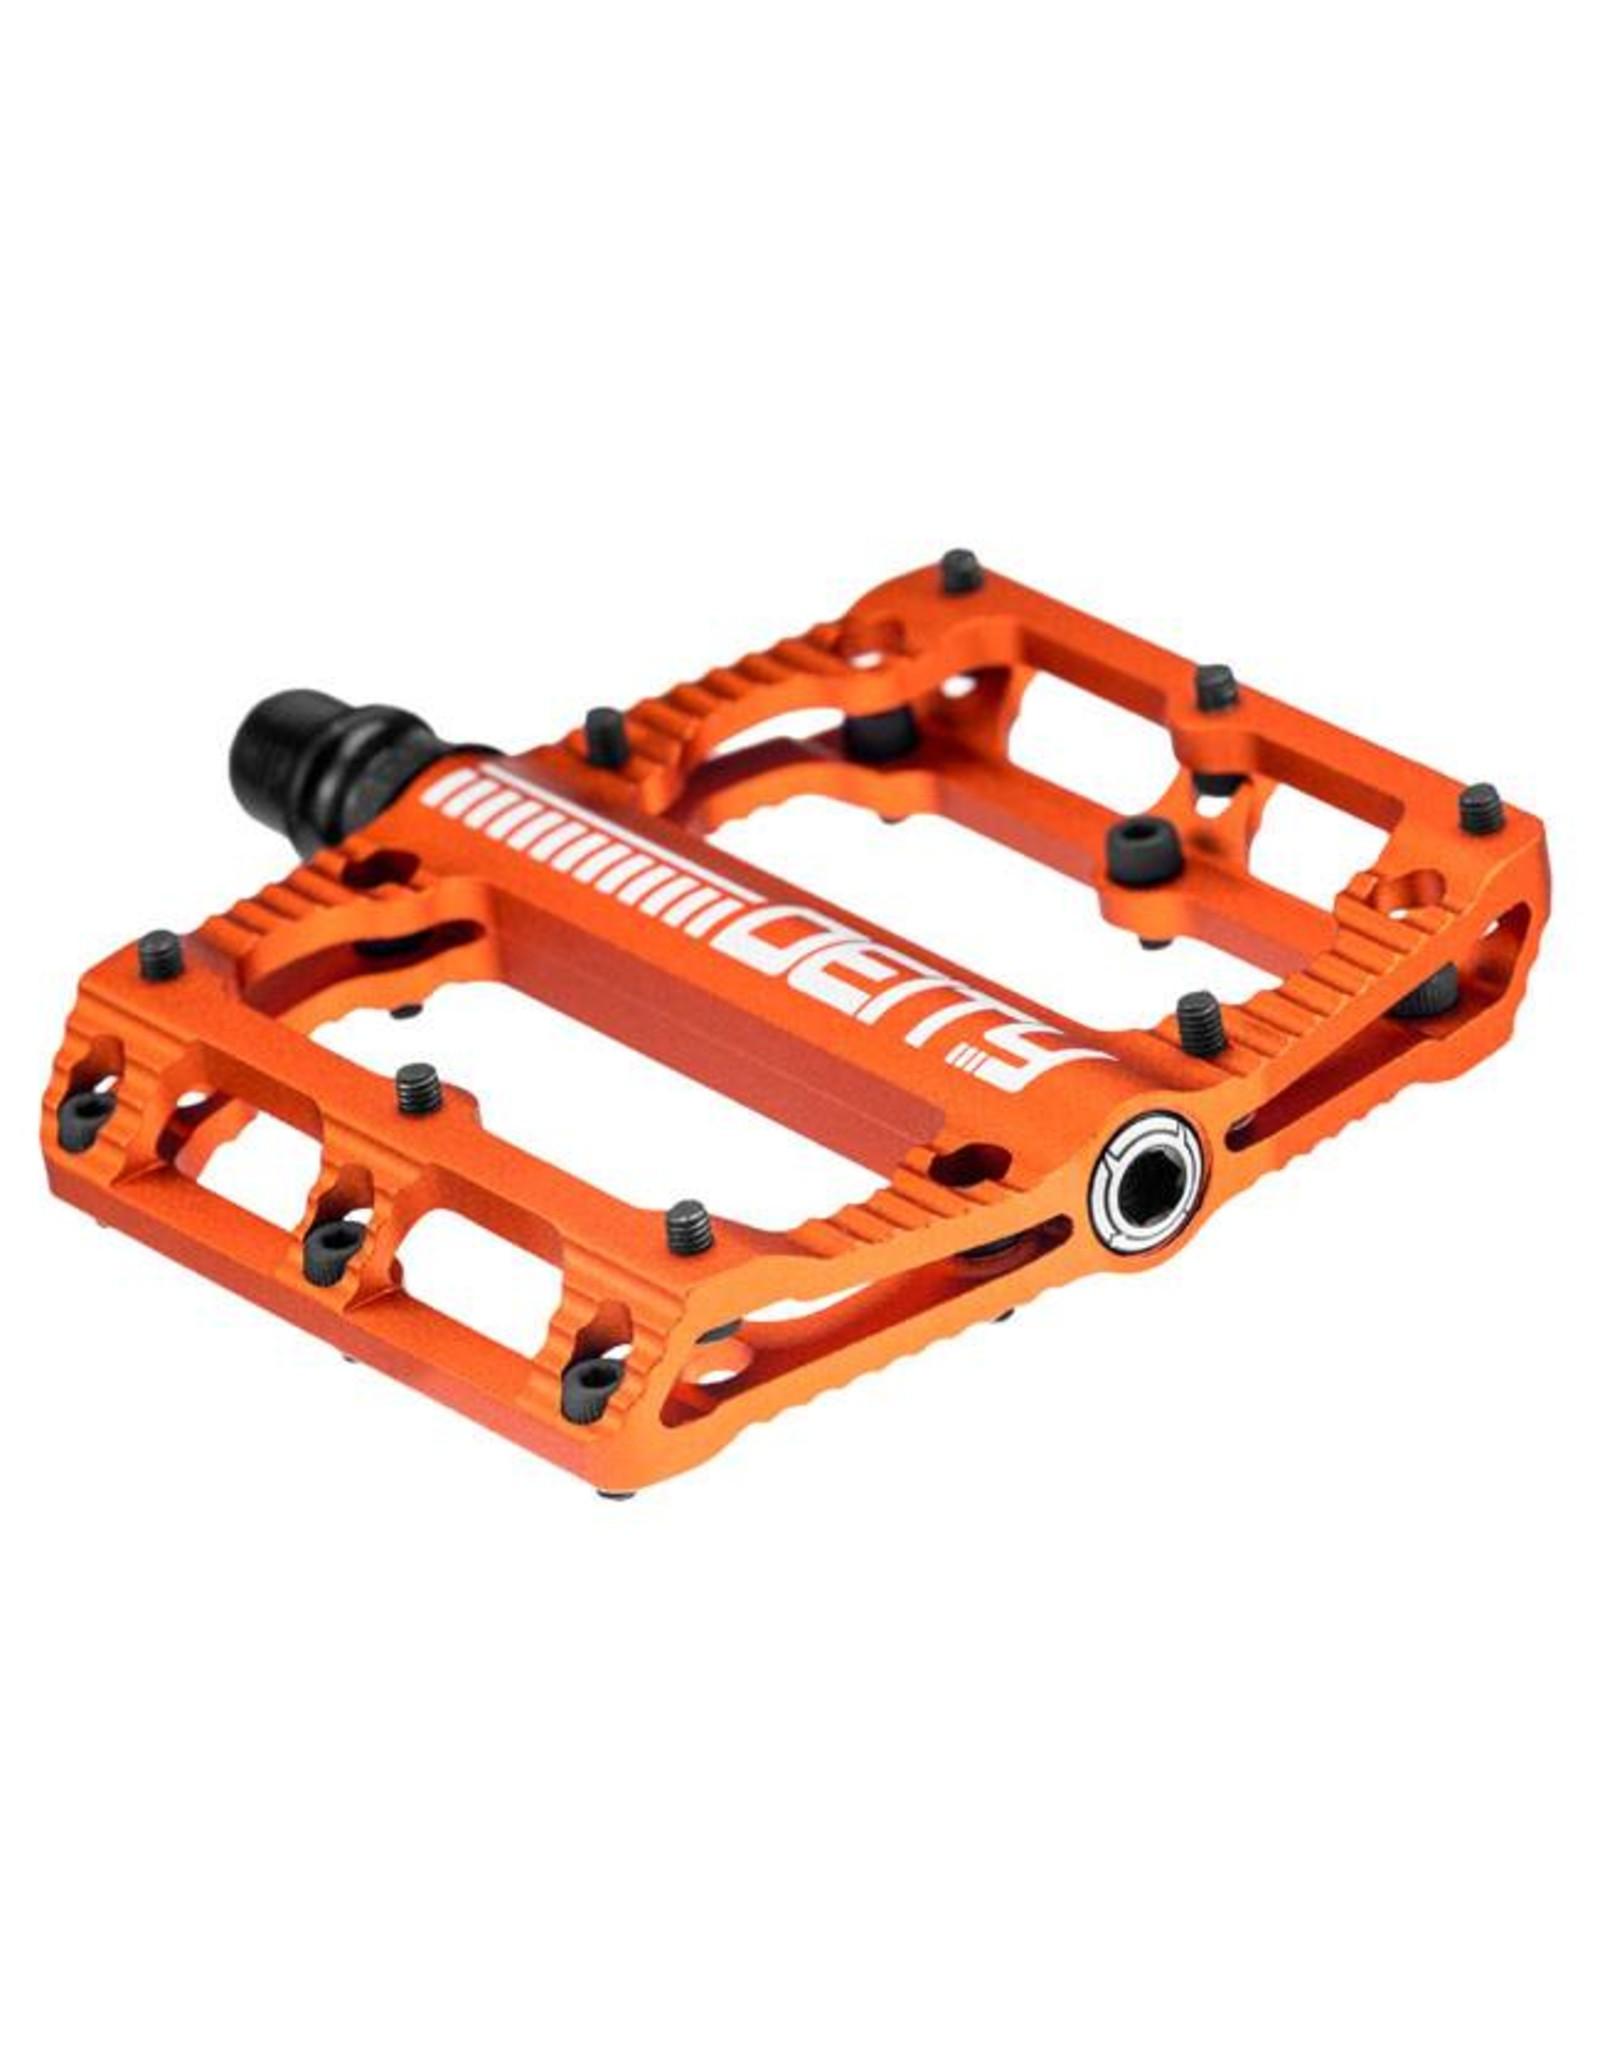 Deity Components Deity Black Kat Pedals: Orange/Laser Graphics